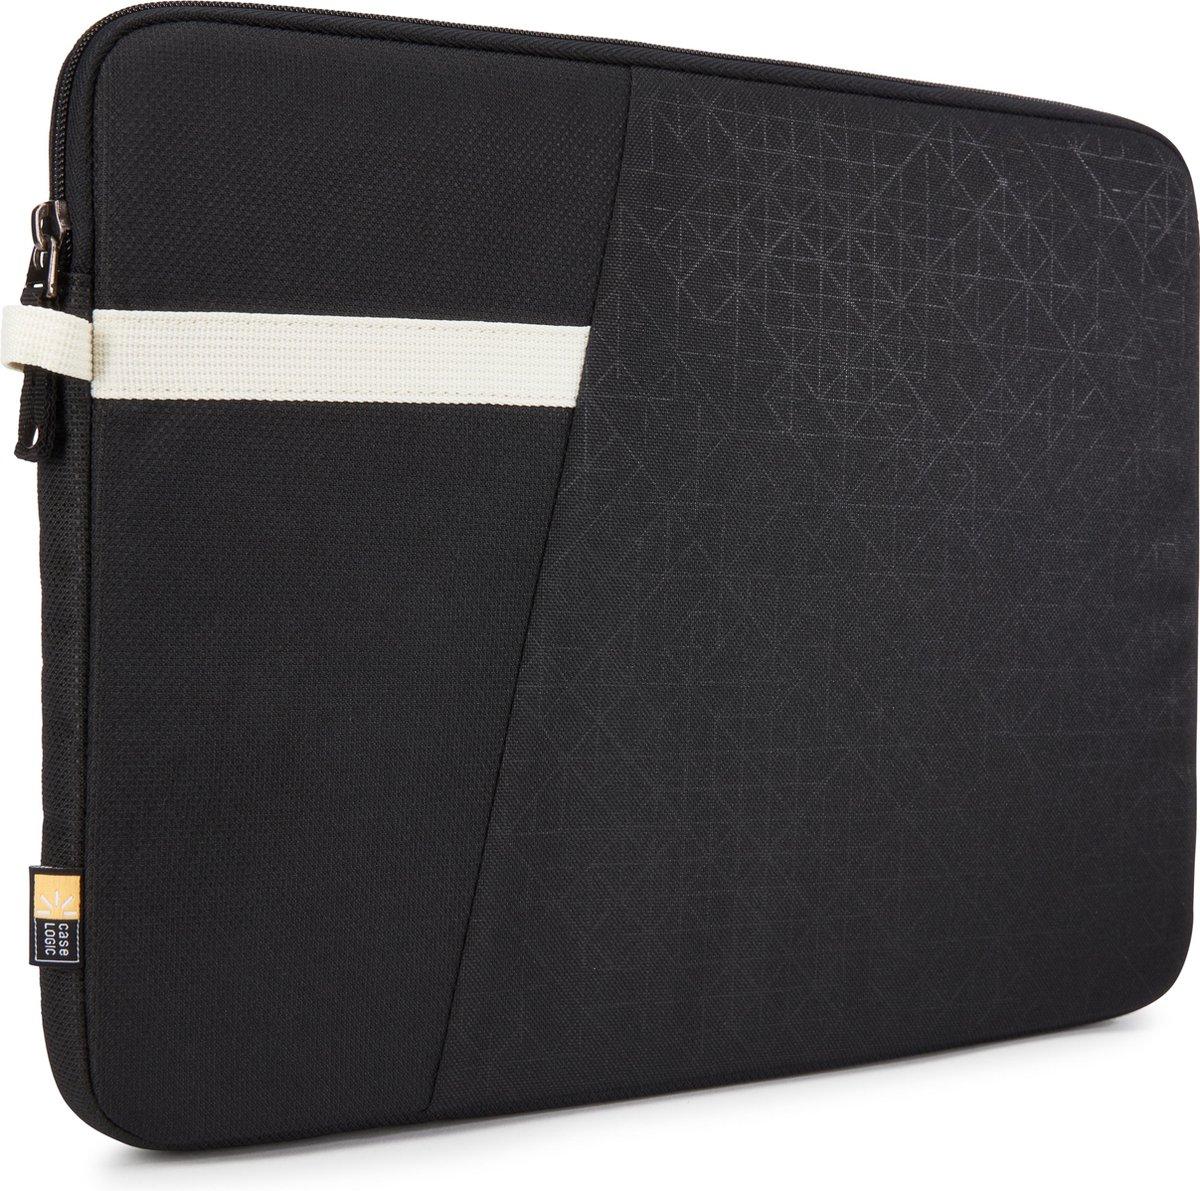 Case Logic Ibira - Laptop Sleeve - 13.3 inch / Zwart